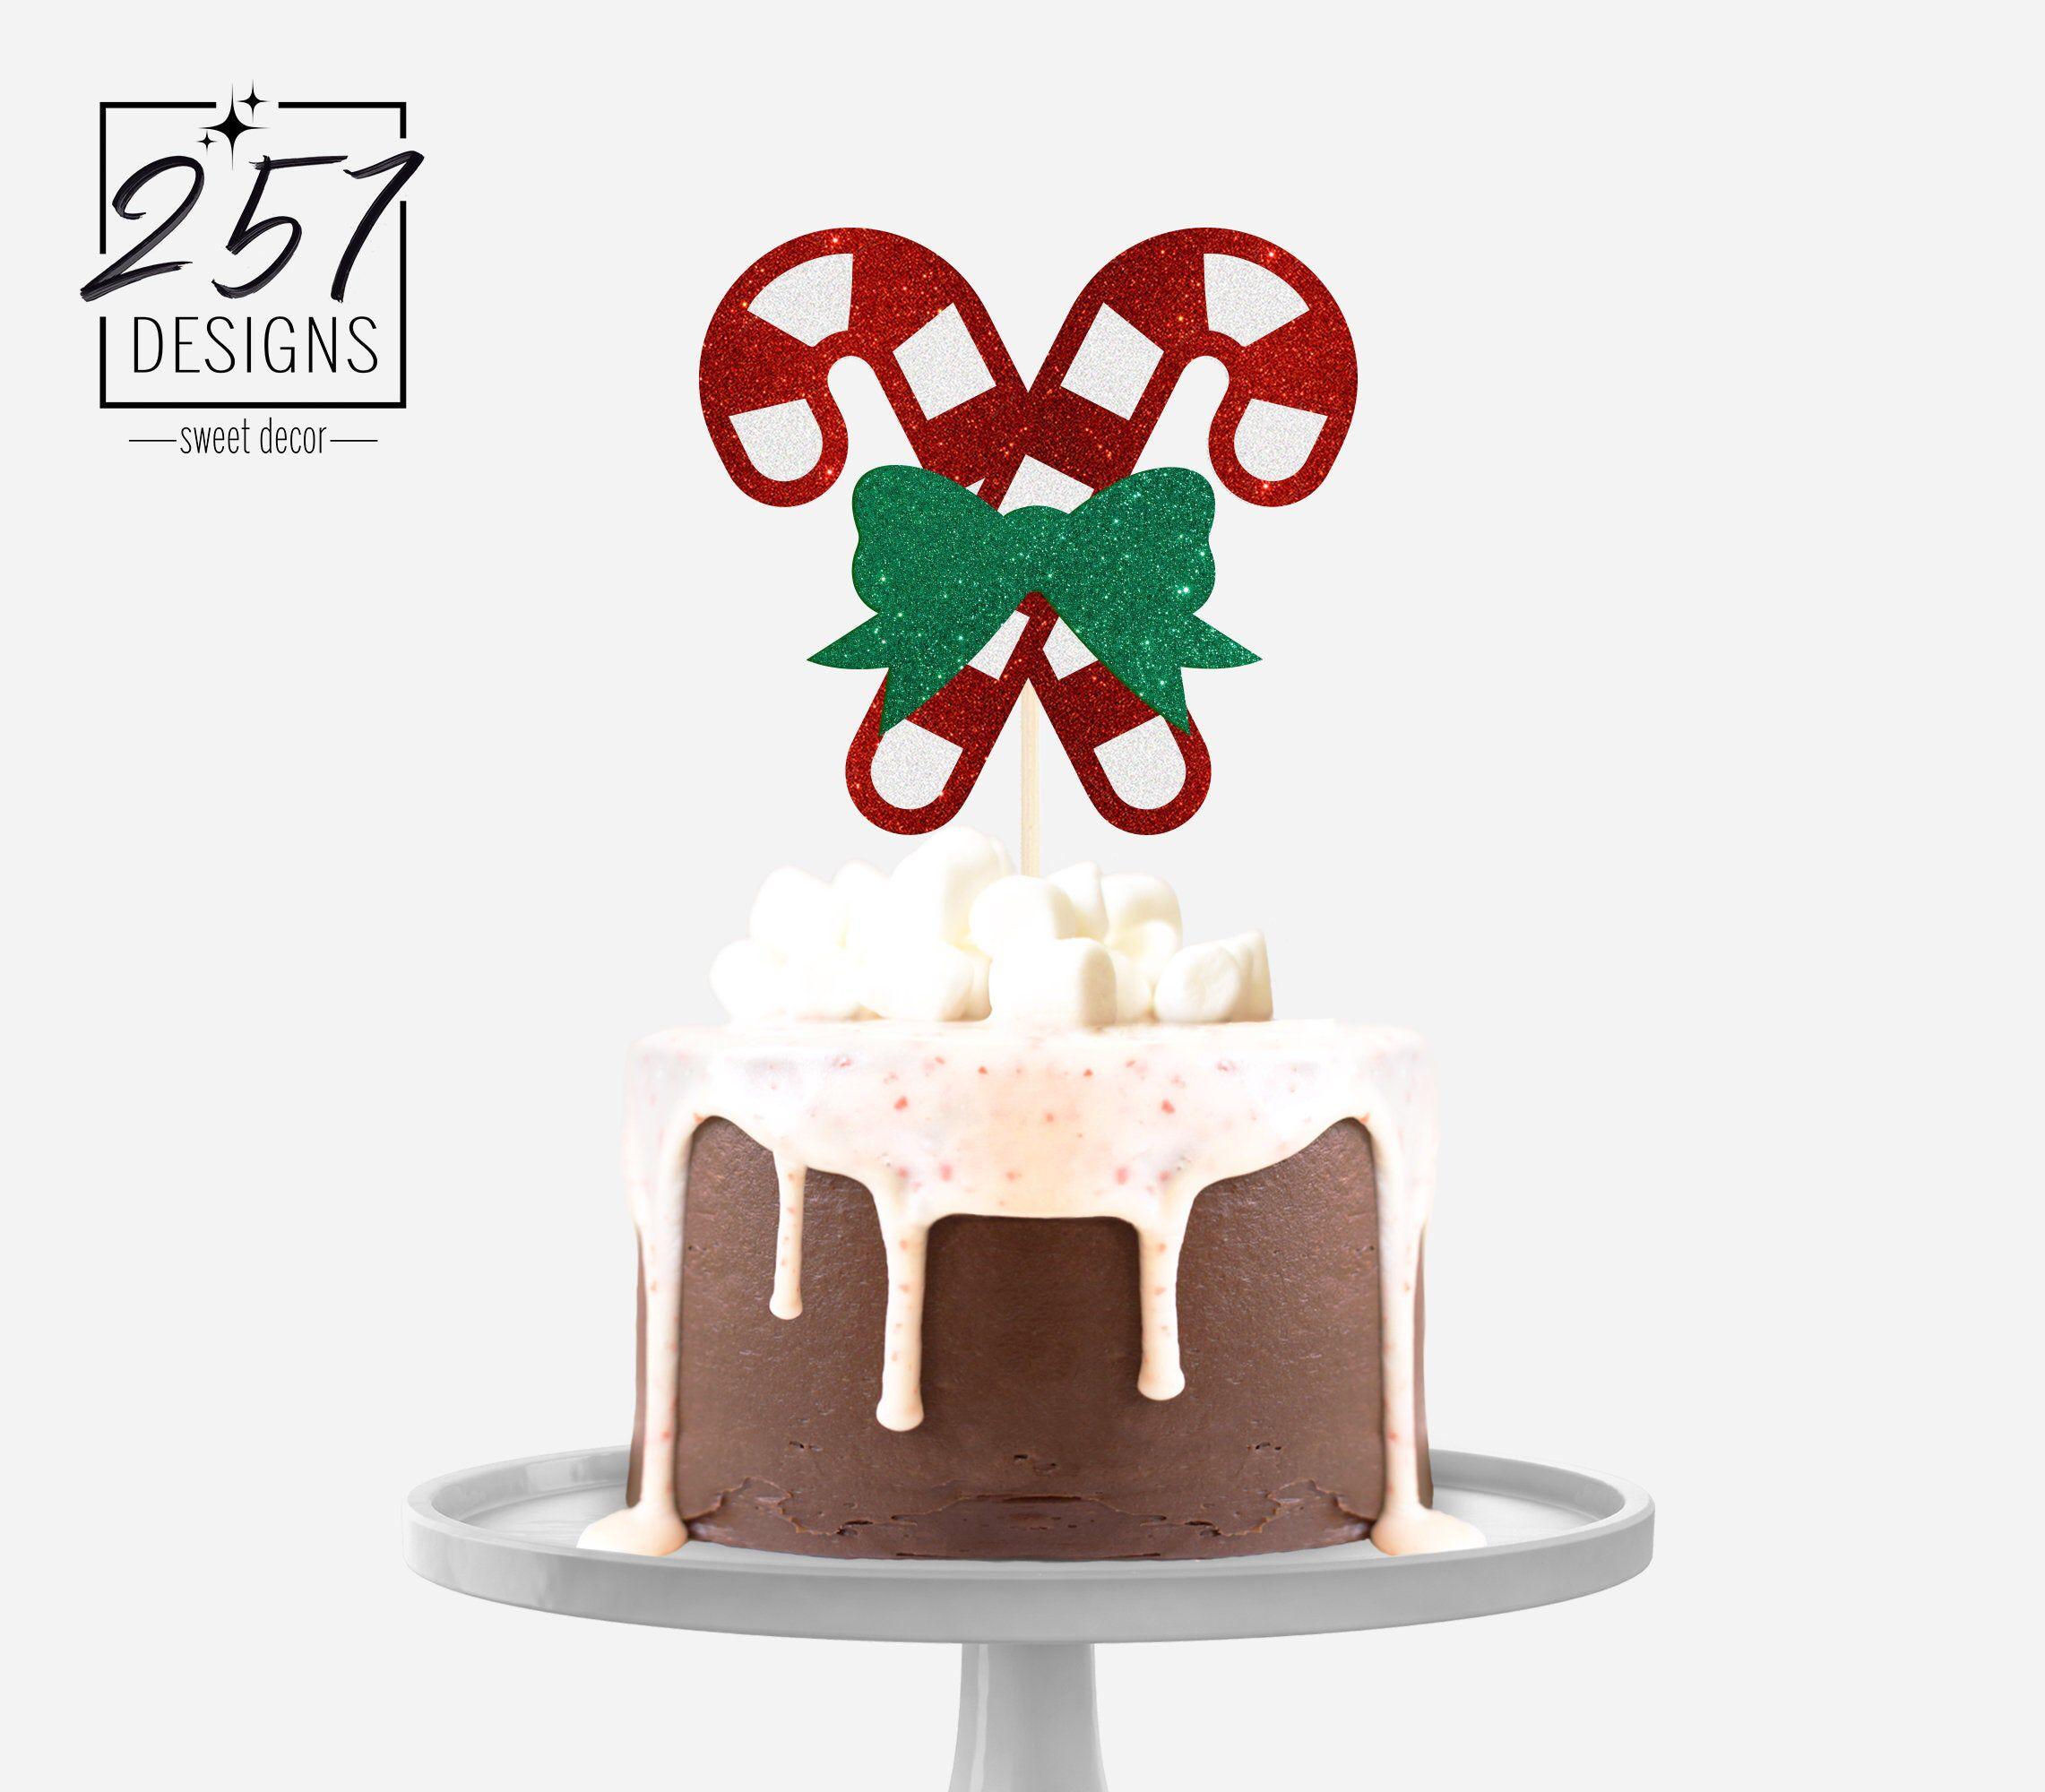 Christmas Cake Topper Merry Christmas Cake Topper Holiday Cake Topper